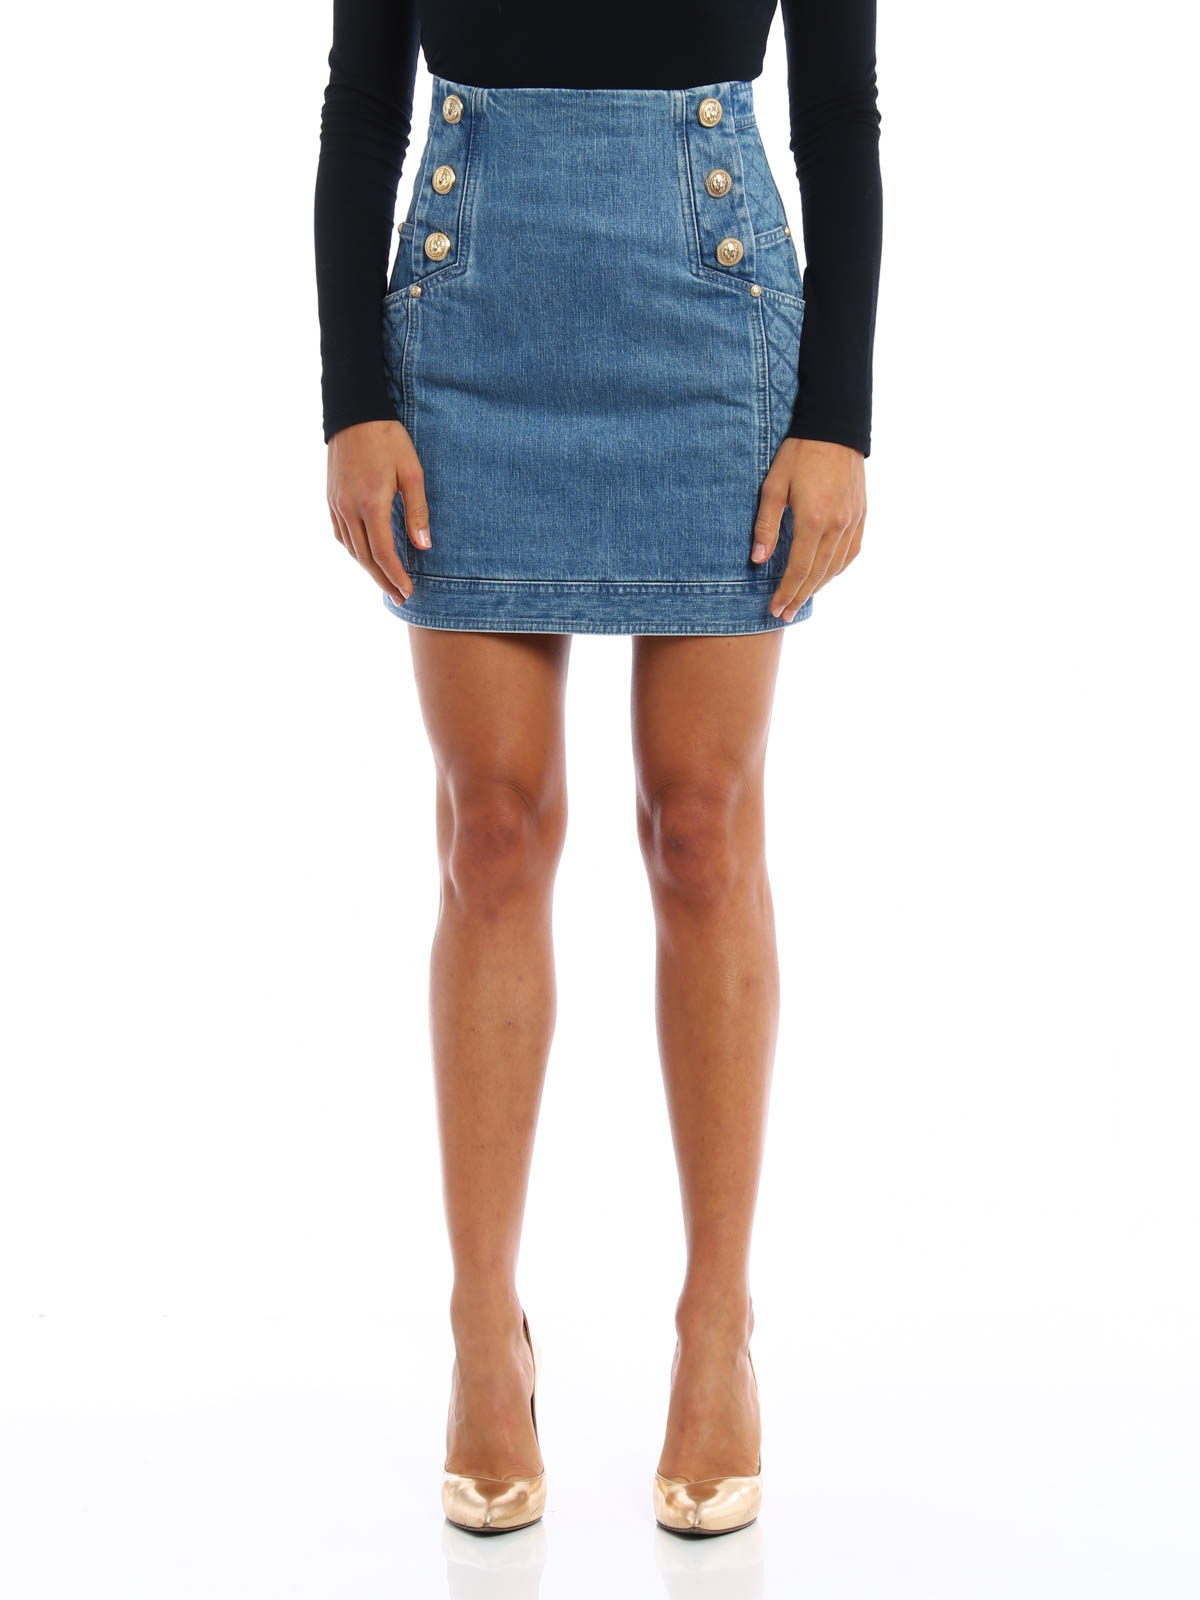 de79f82f28 Balmain - Button detailed denim mini skirt - mini skirts - 4265 101K ...